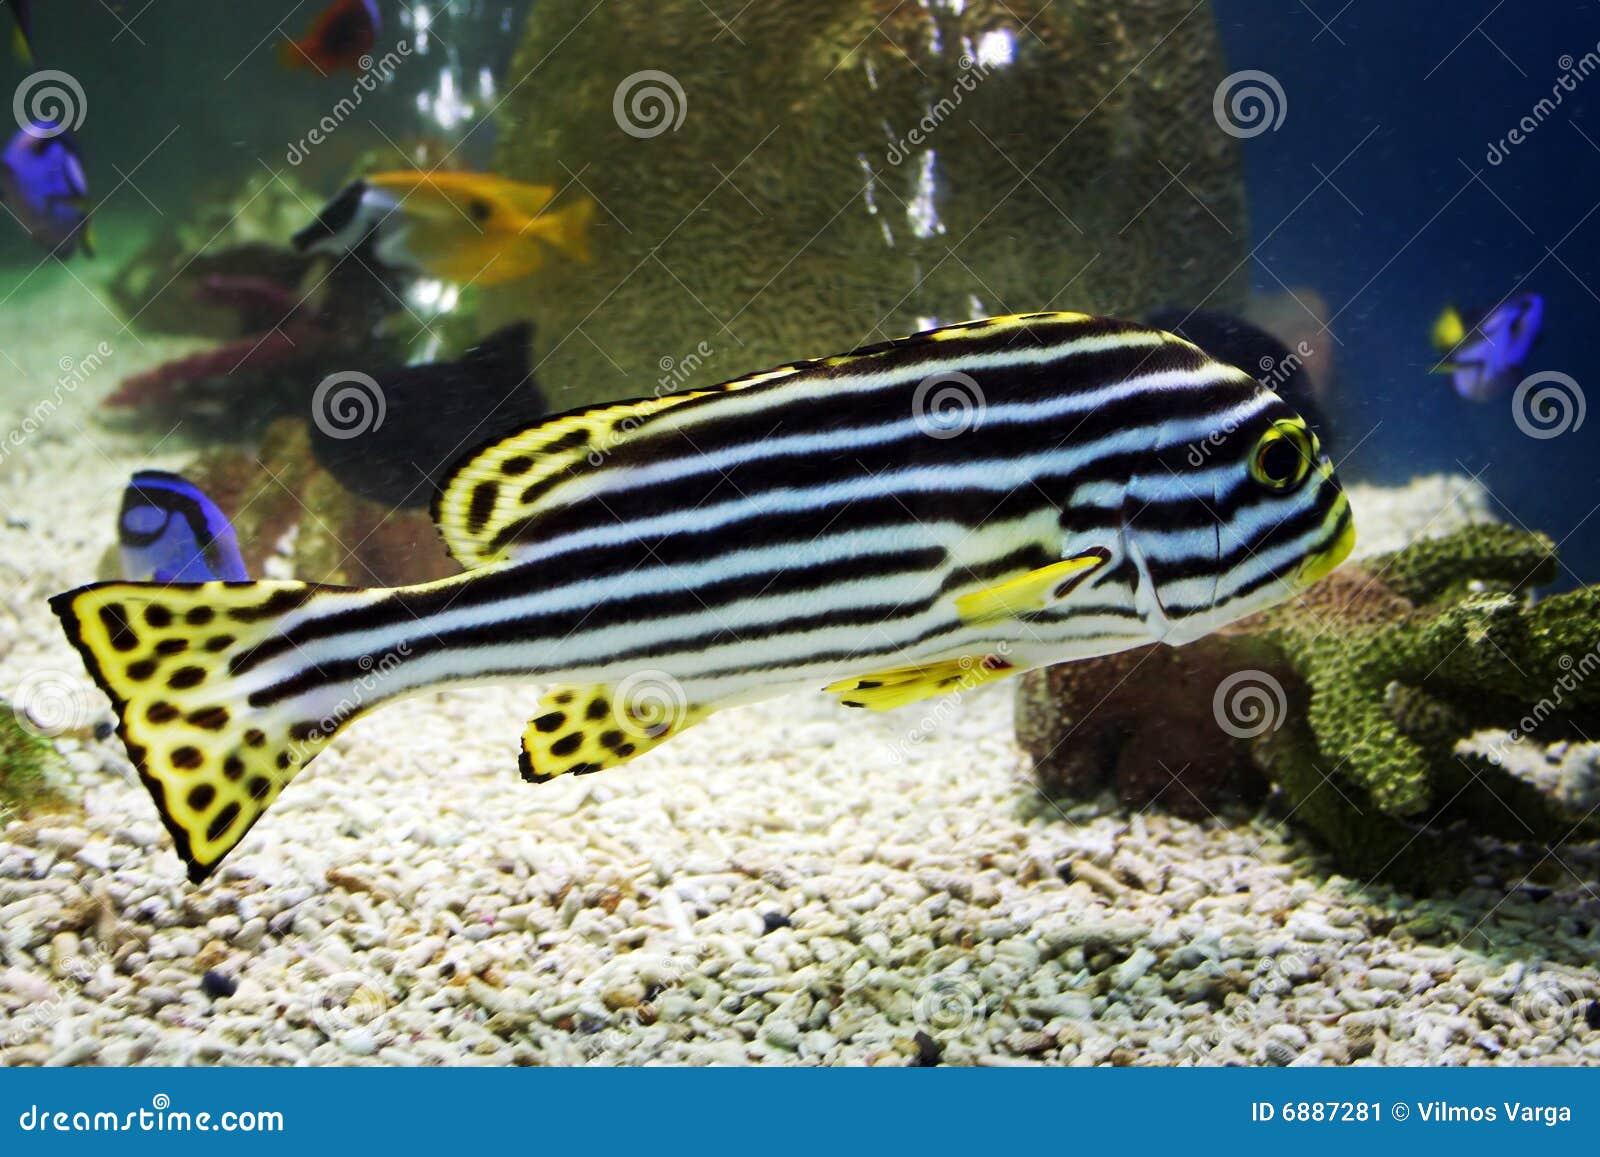 Zebra fische stockbild bild 6887281 for Salzwasser aquarium fische